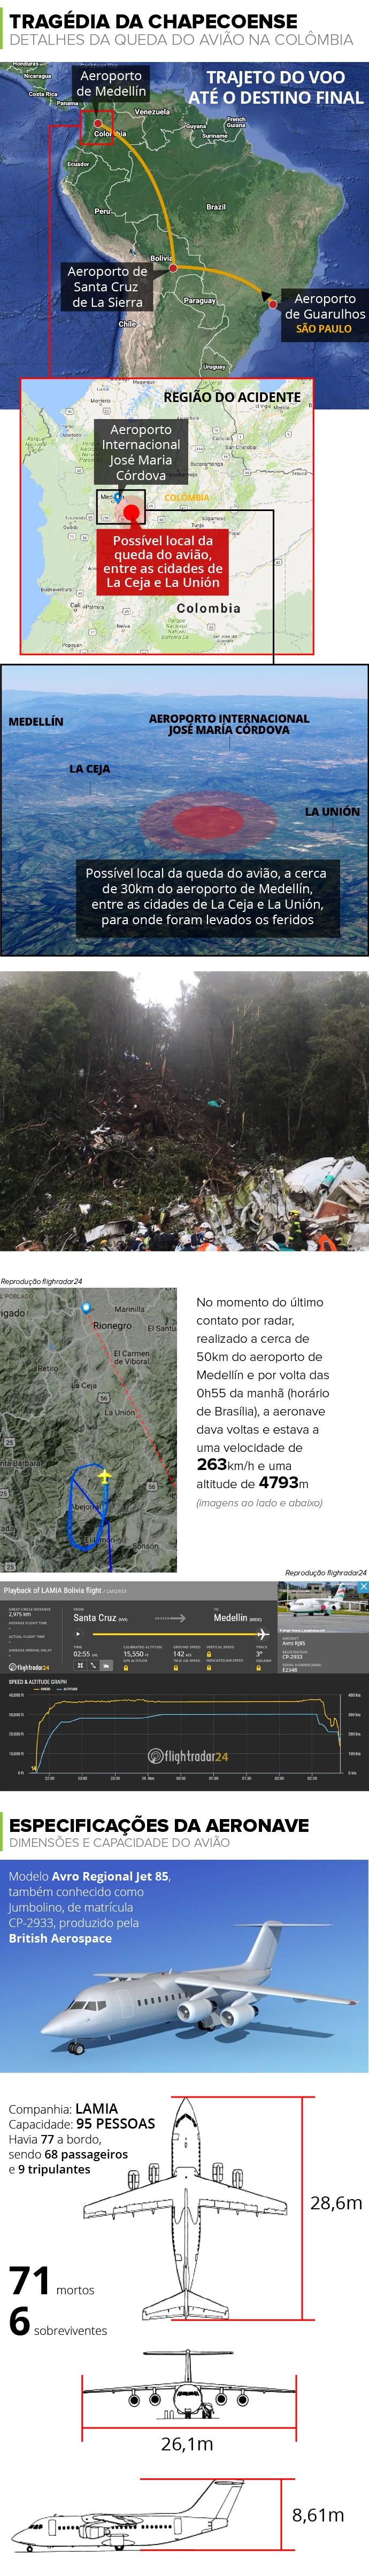 Info-QUEDA-AVIAO-Chapecoense-M (Foto: Infoesporte)